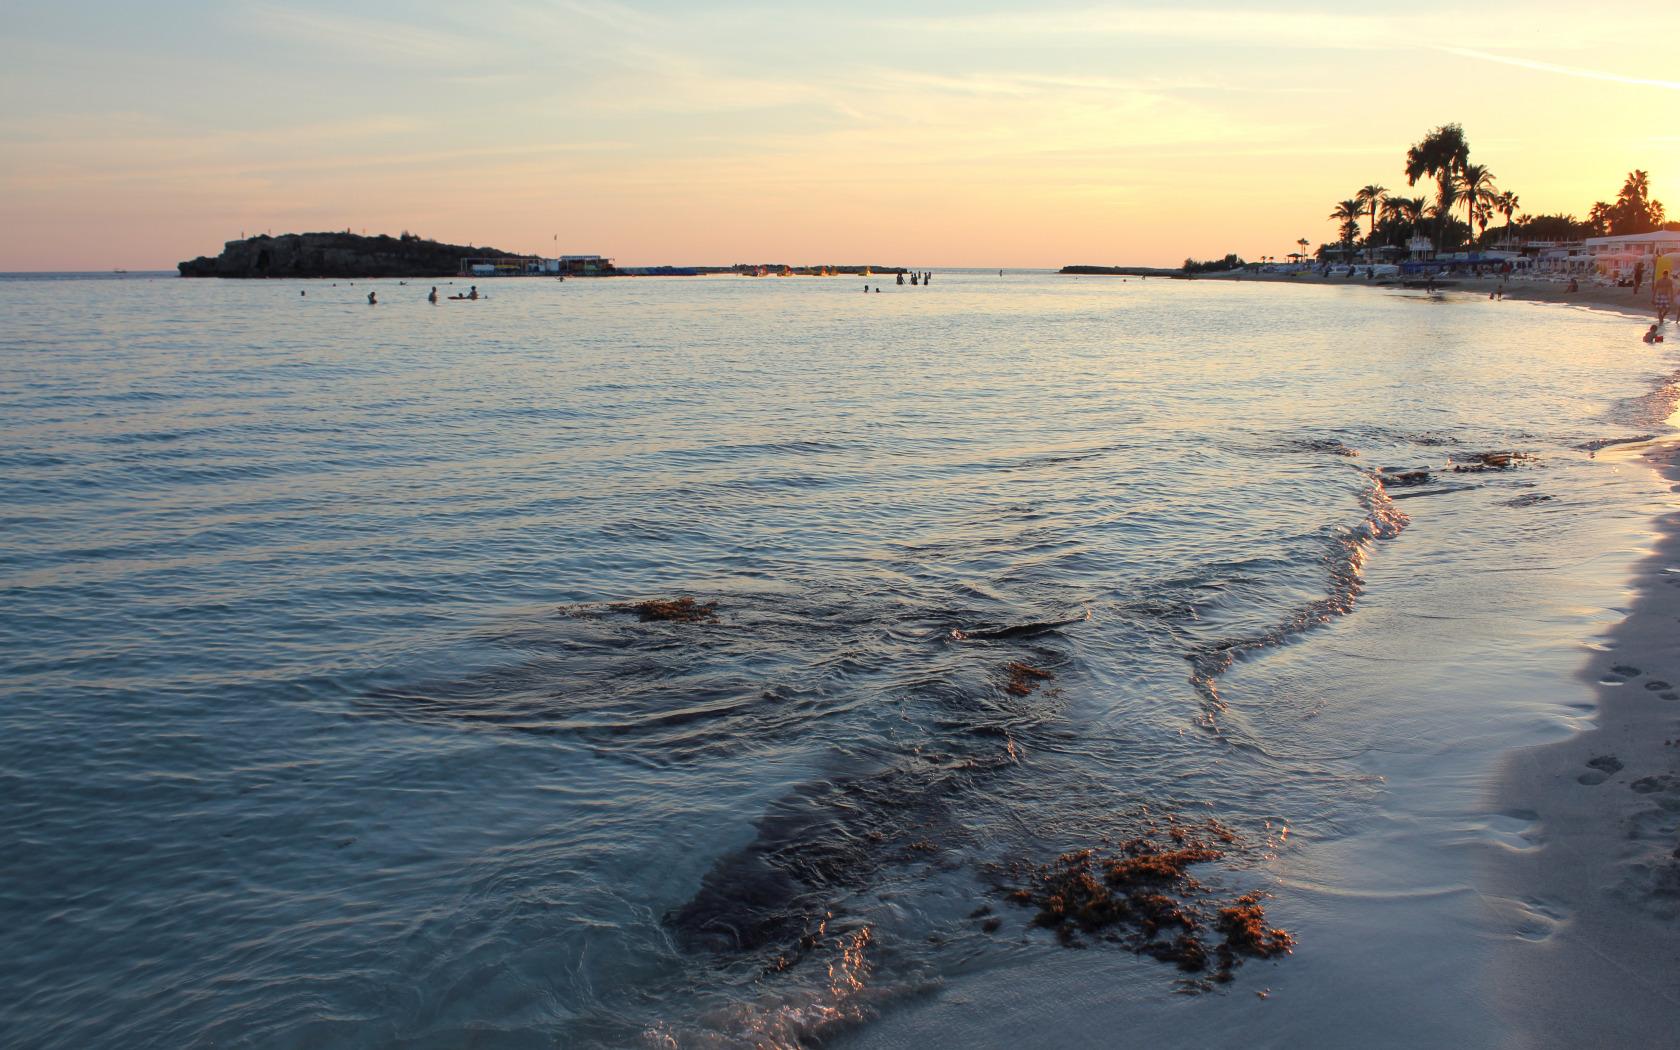 Айя напа ayia napa nissi beach